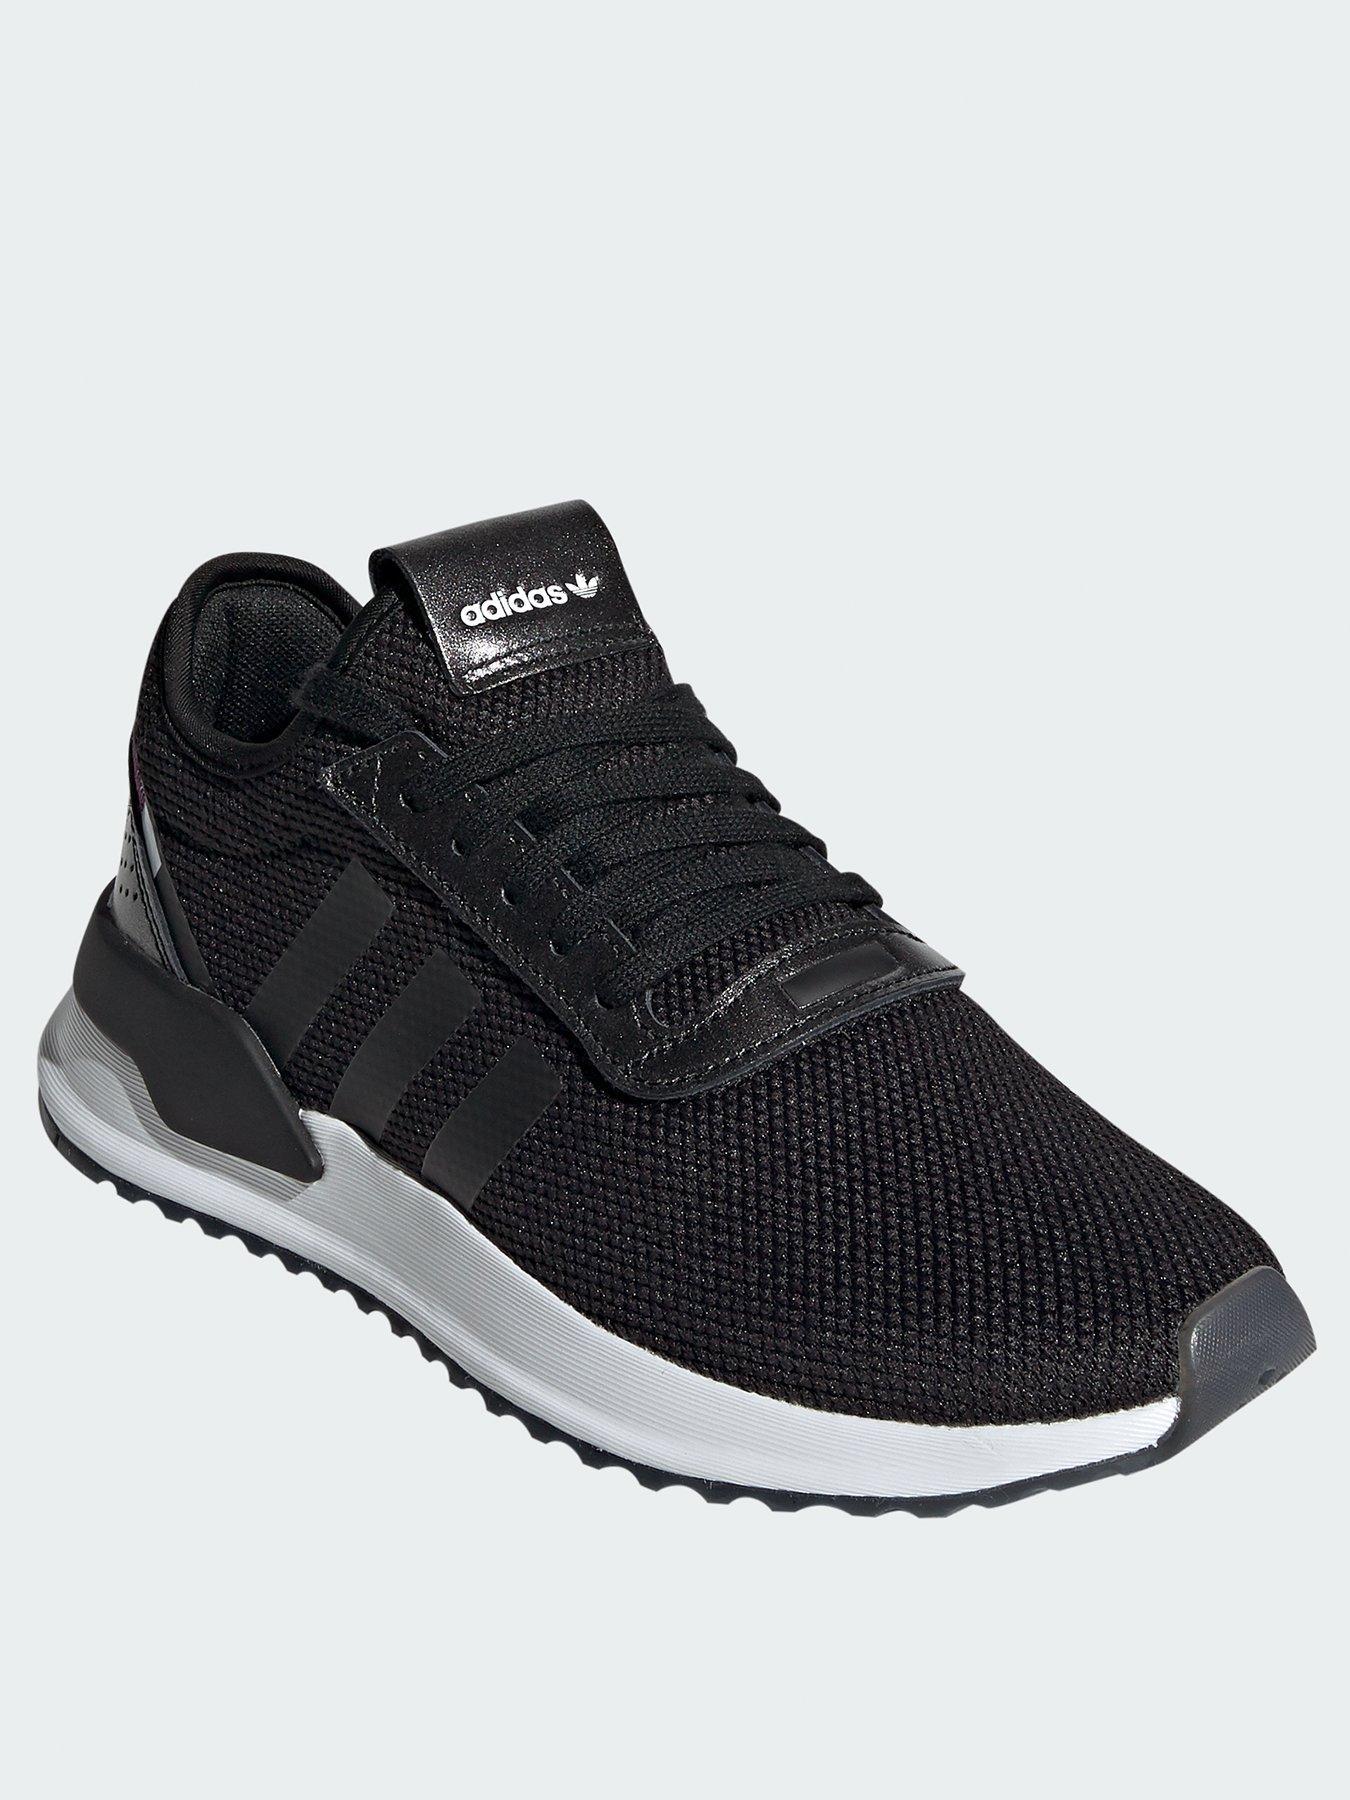 Womens adidas Trainers | Adidas Sports